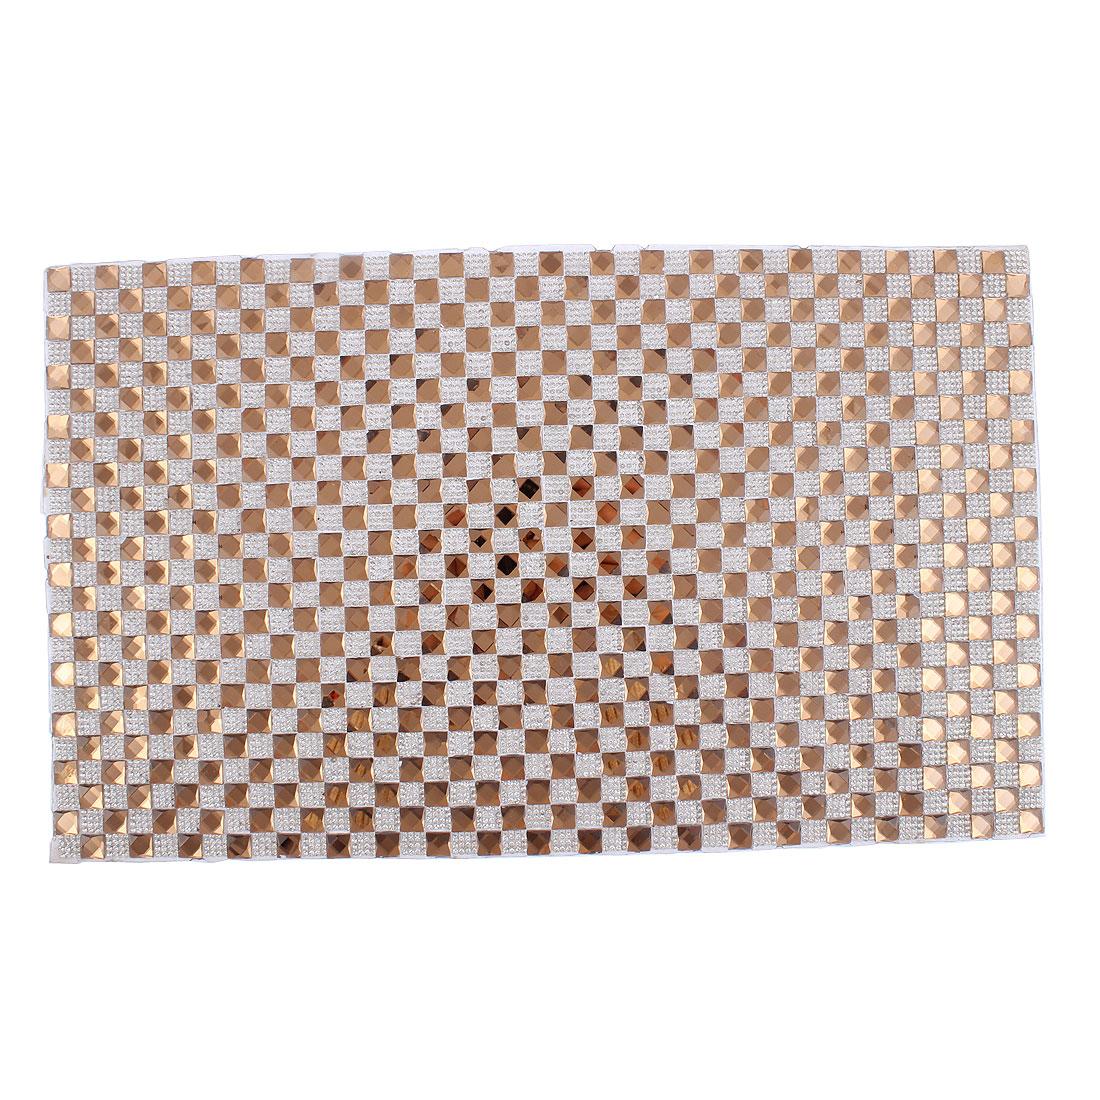 Shoes Handbags DIY Rhinestone Plate Sticker Decor 400 x 240mm Brown